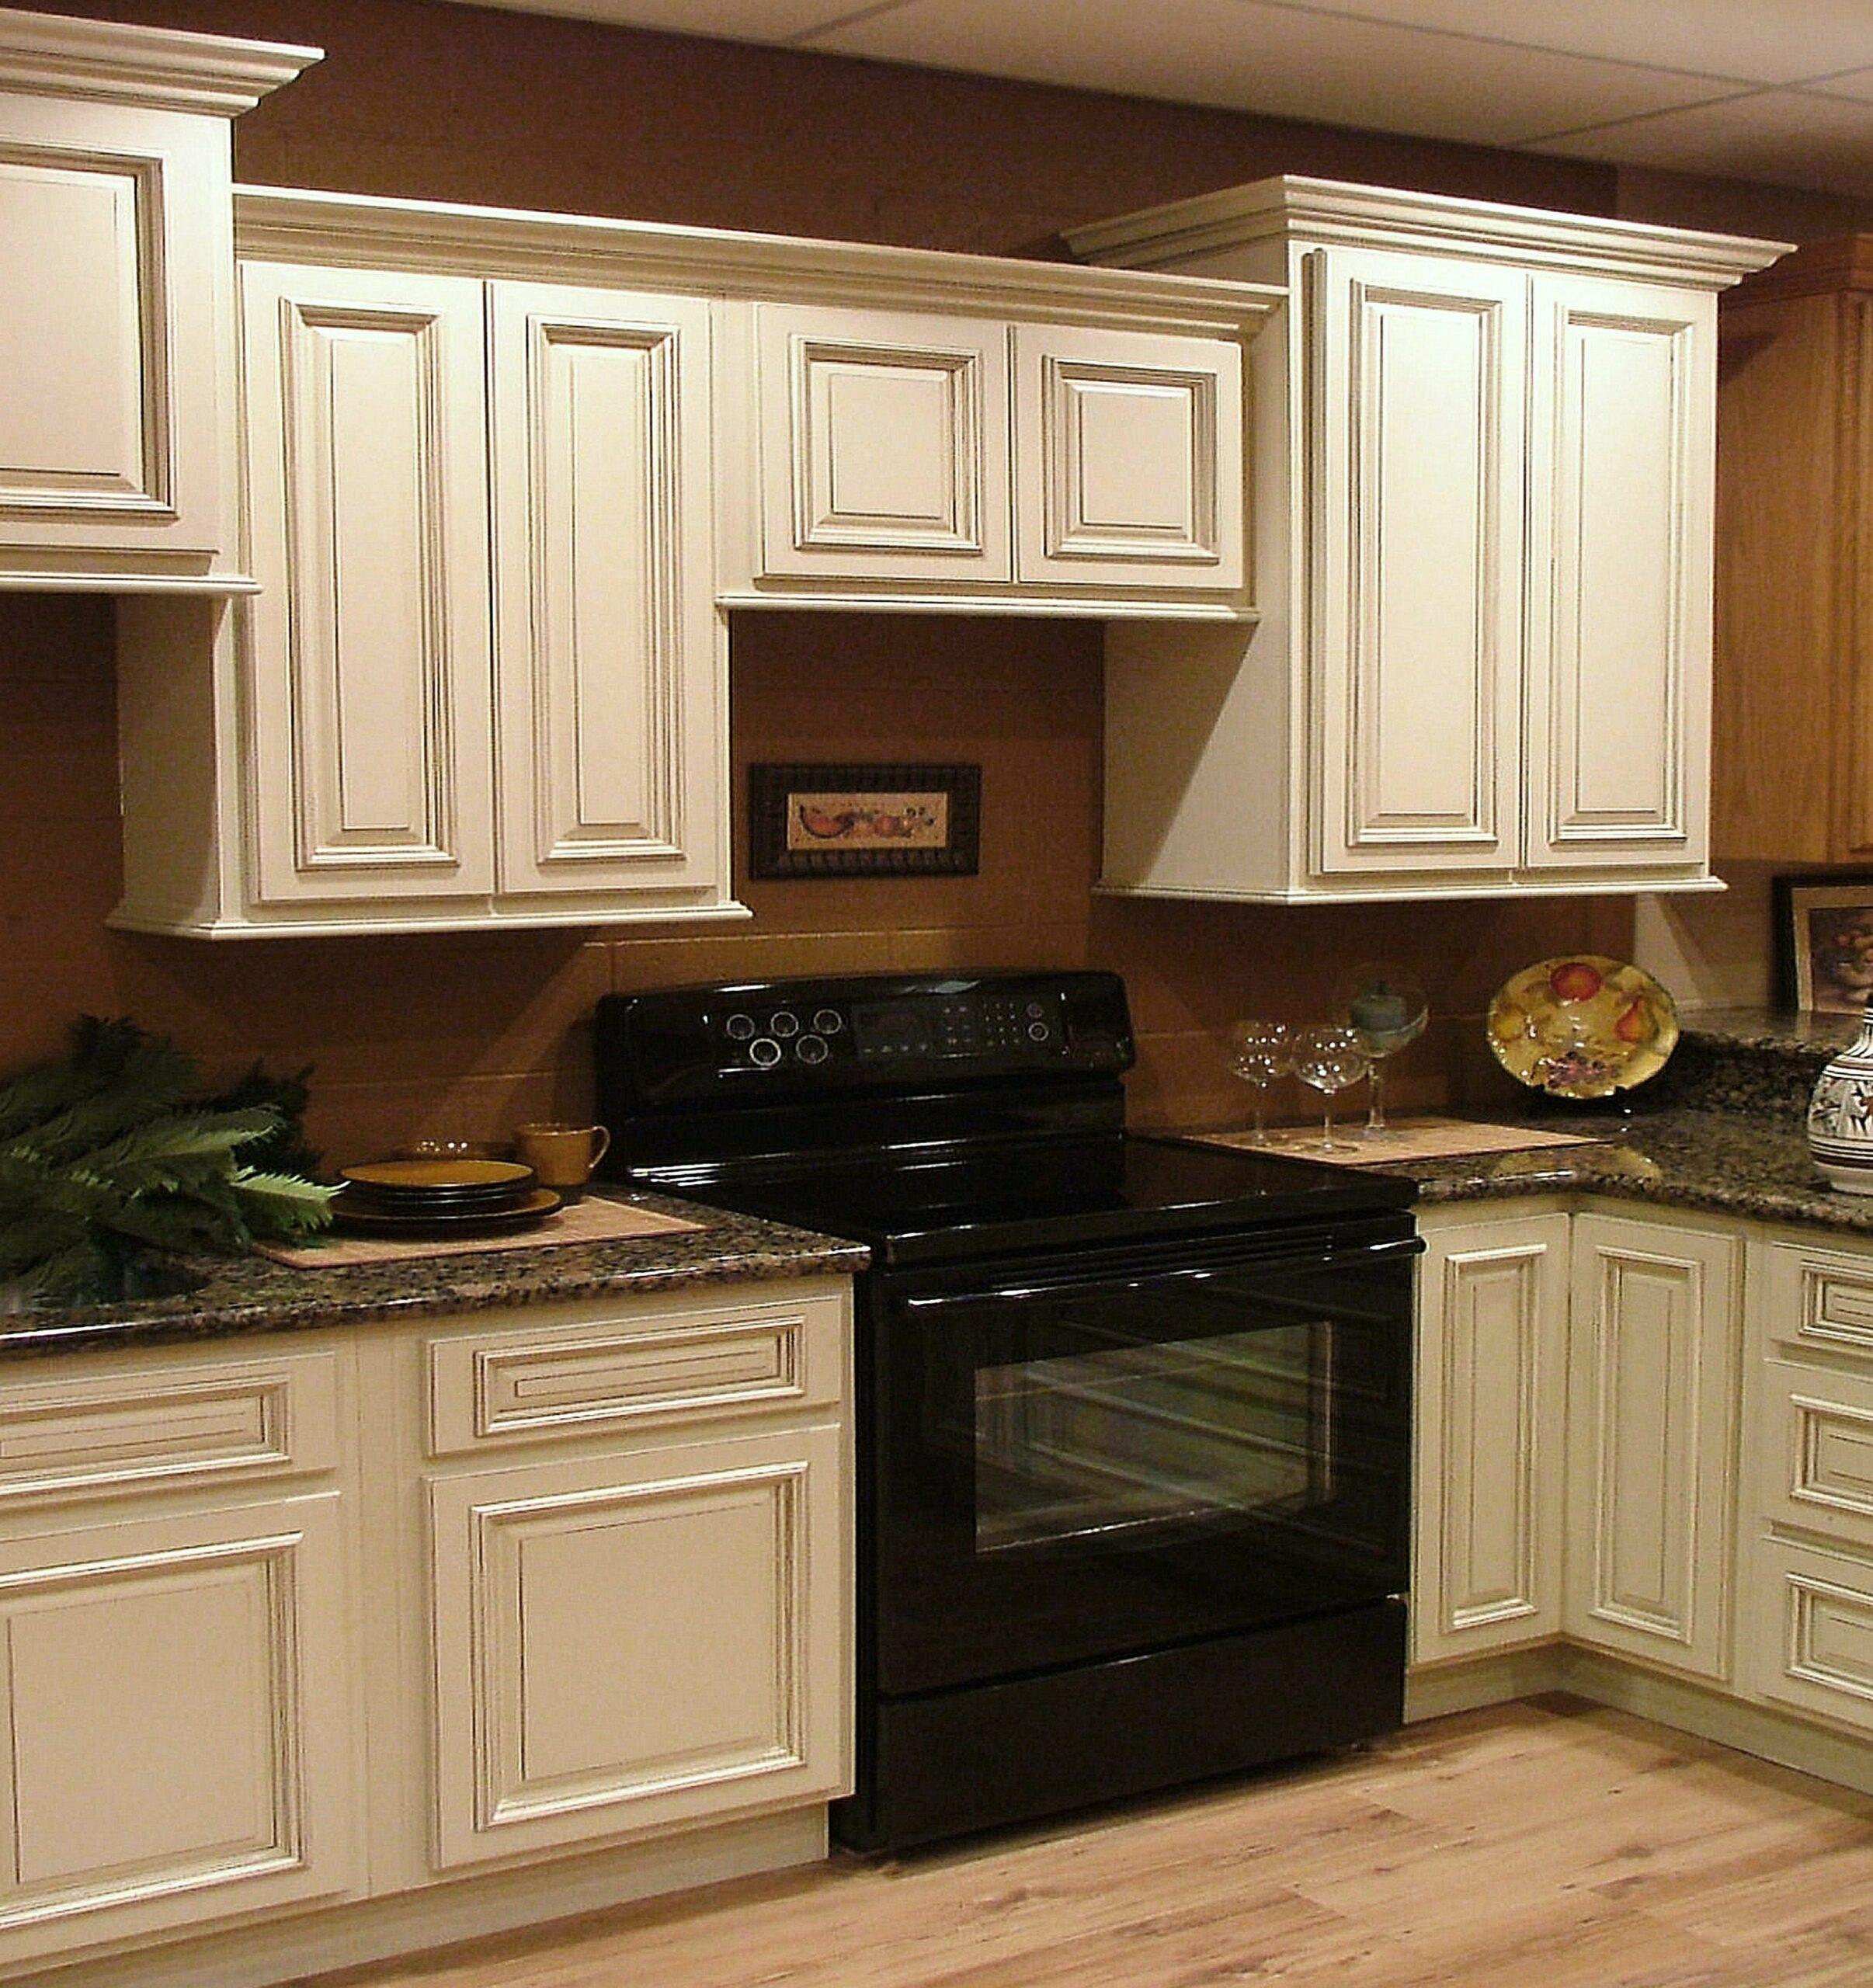 Oak Cabinets Painted Antique White